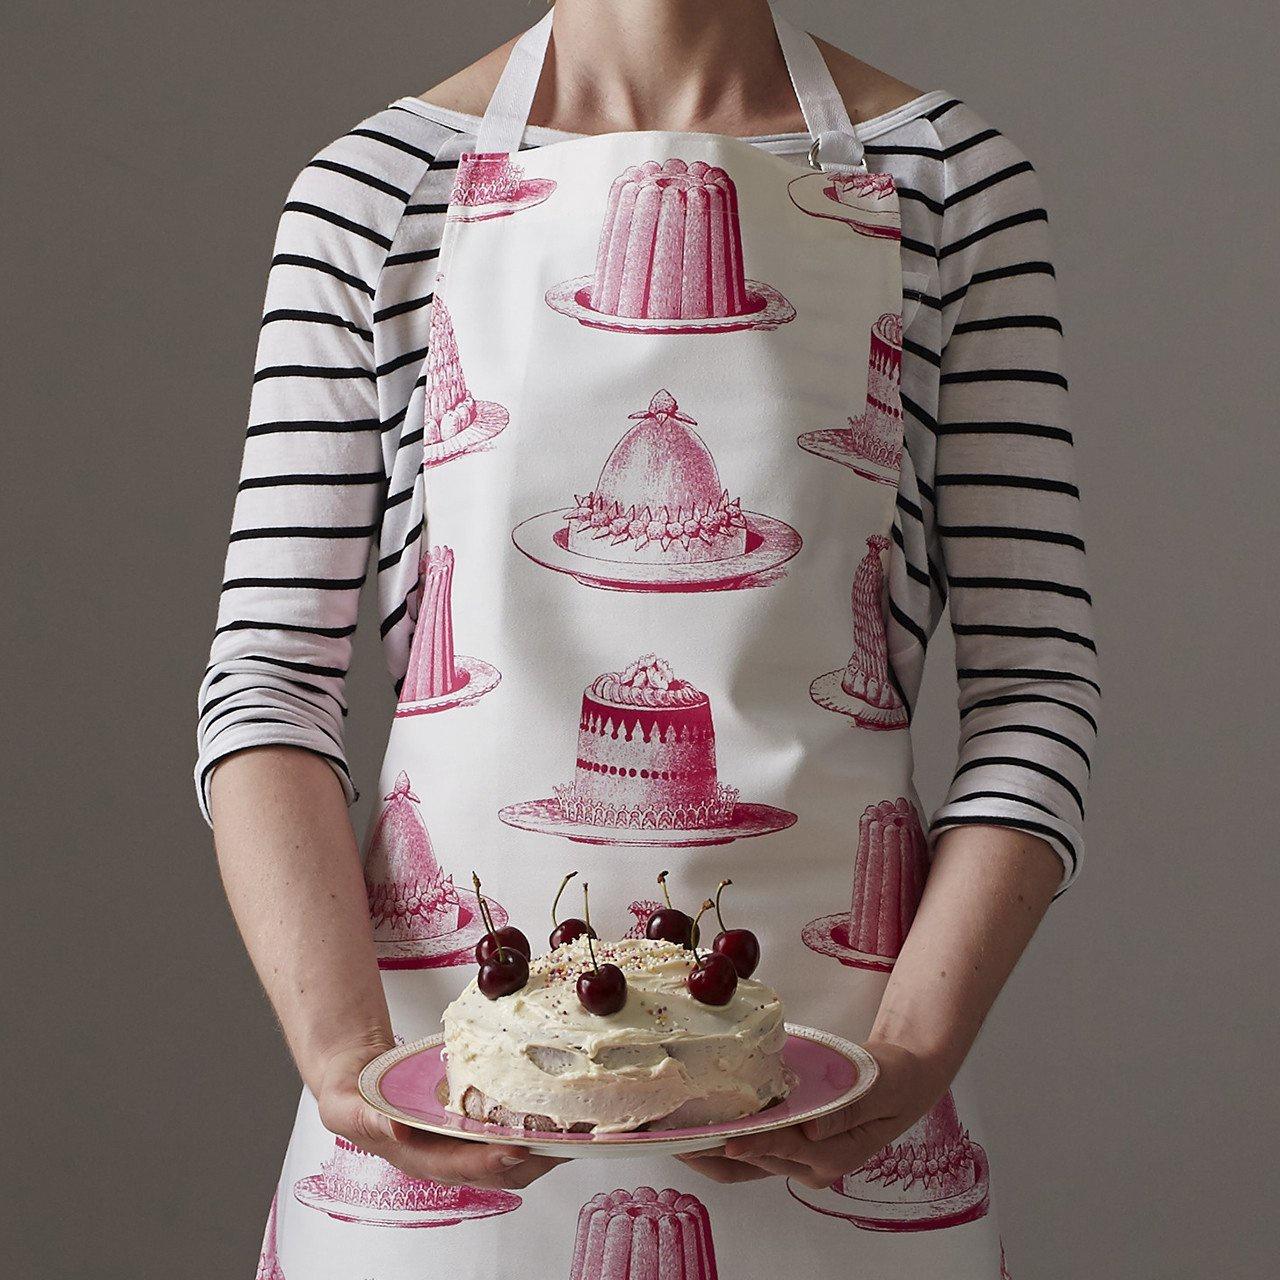 Apron-Jelly & Cake